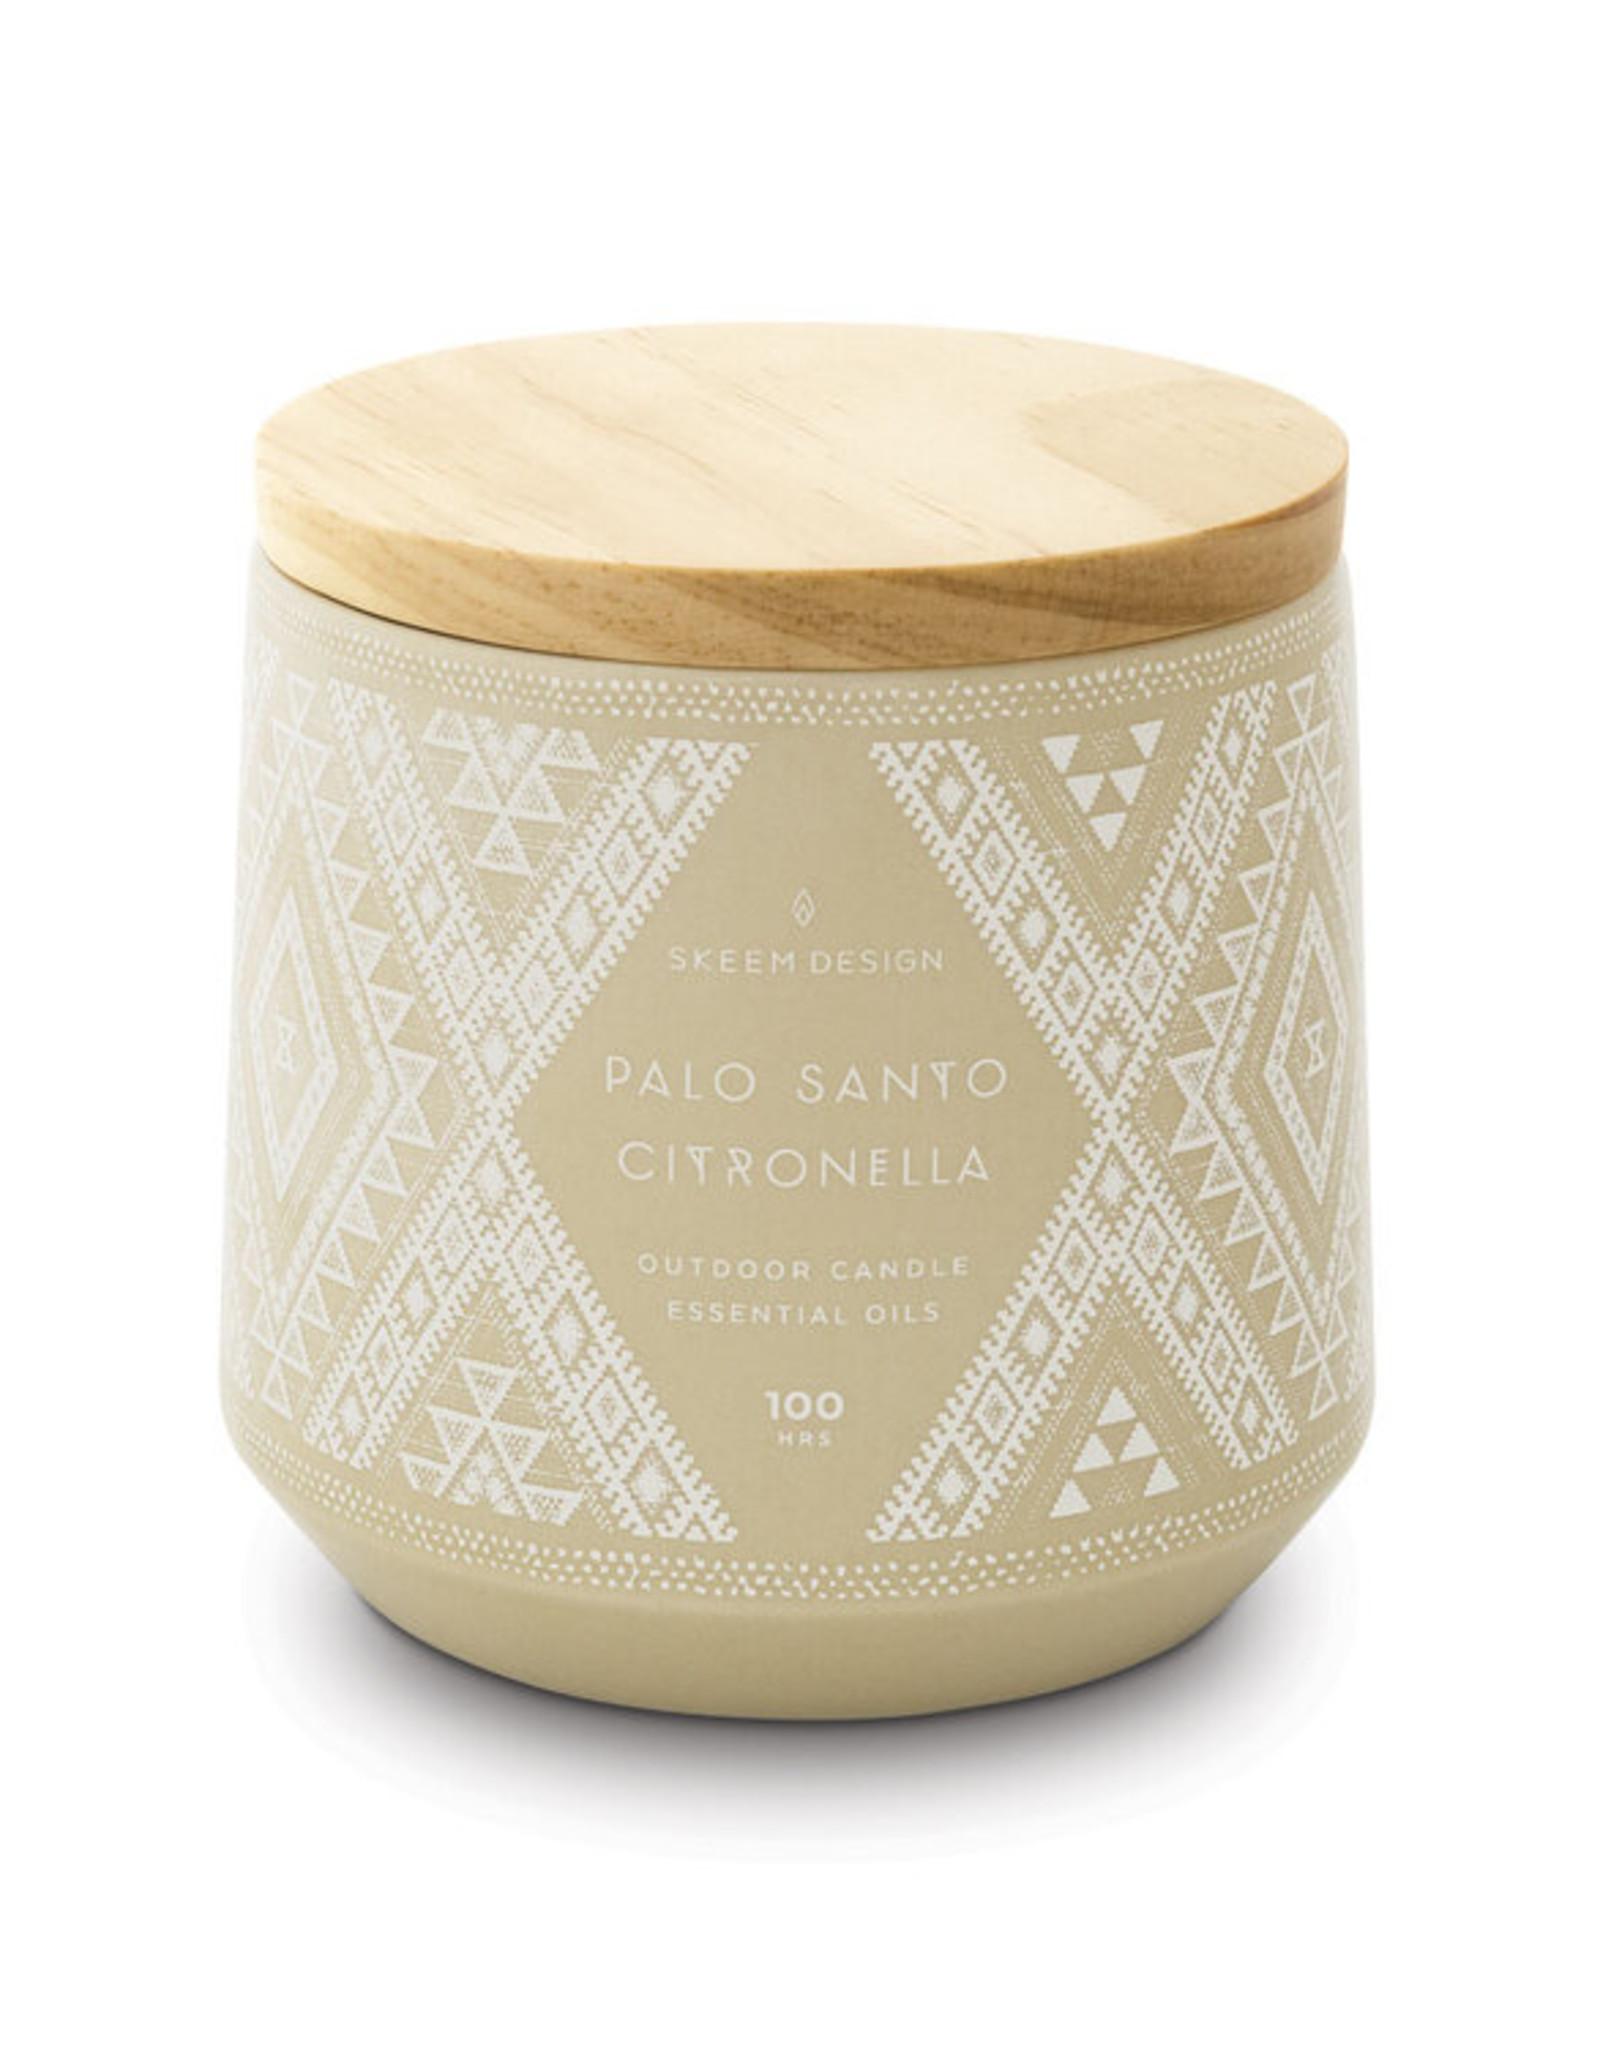 Skeem Design Candle - Palo Santo Citronella